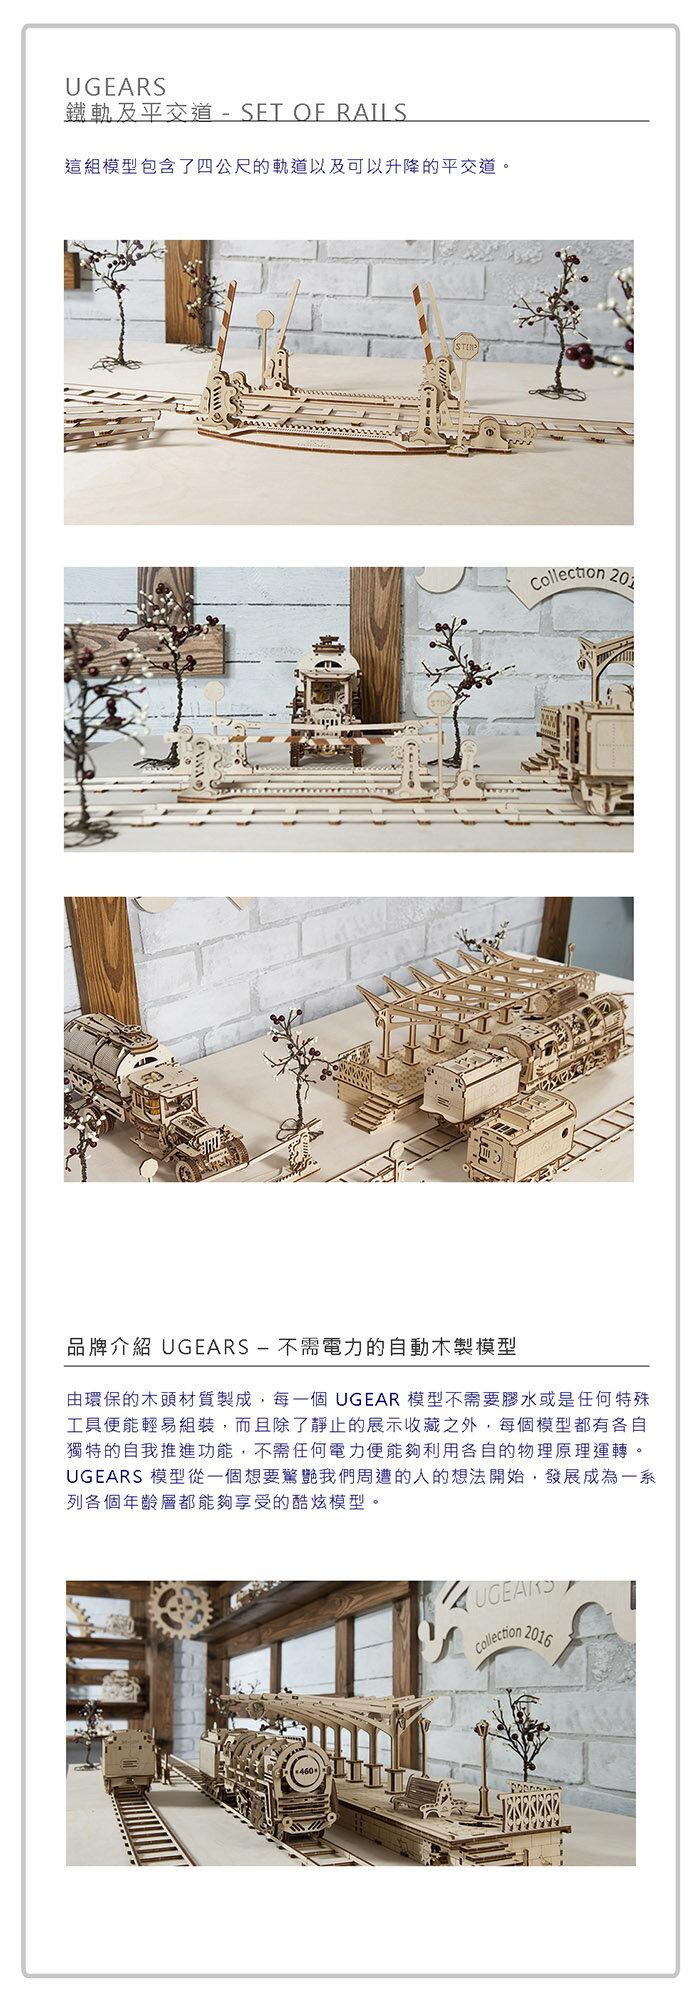 Ugears 自我推進模型 (Set of rails 鐵軌及平交道)